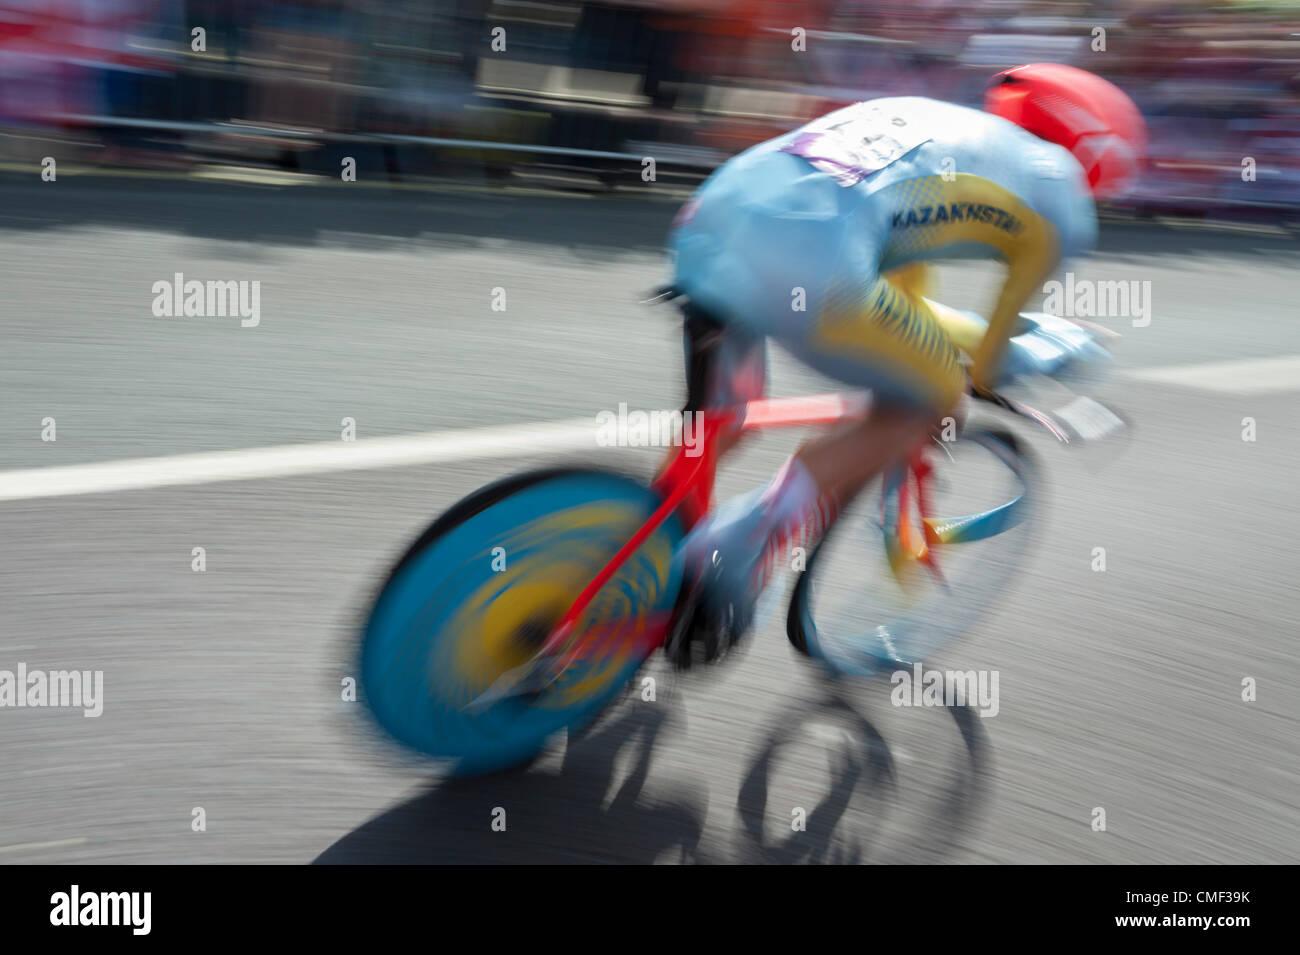 Alexandr VINOKUROV  of Kazakstan crosses Kingston Bridge during the Men's Individual cycling time trial at the - Stock Image